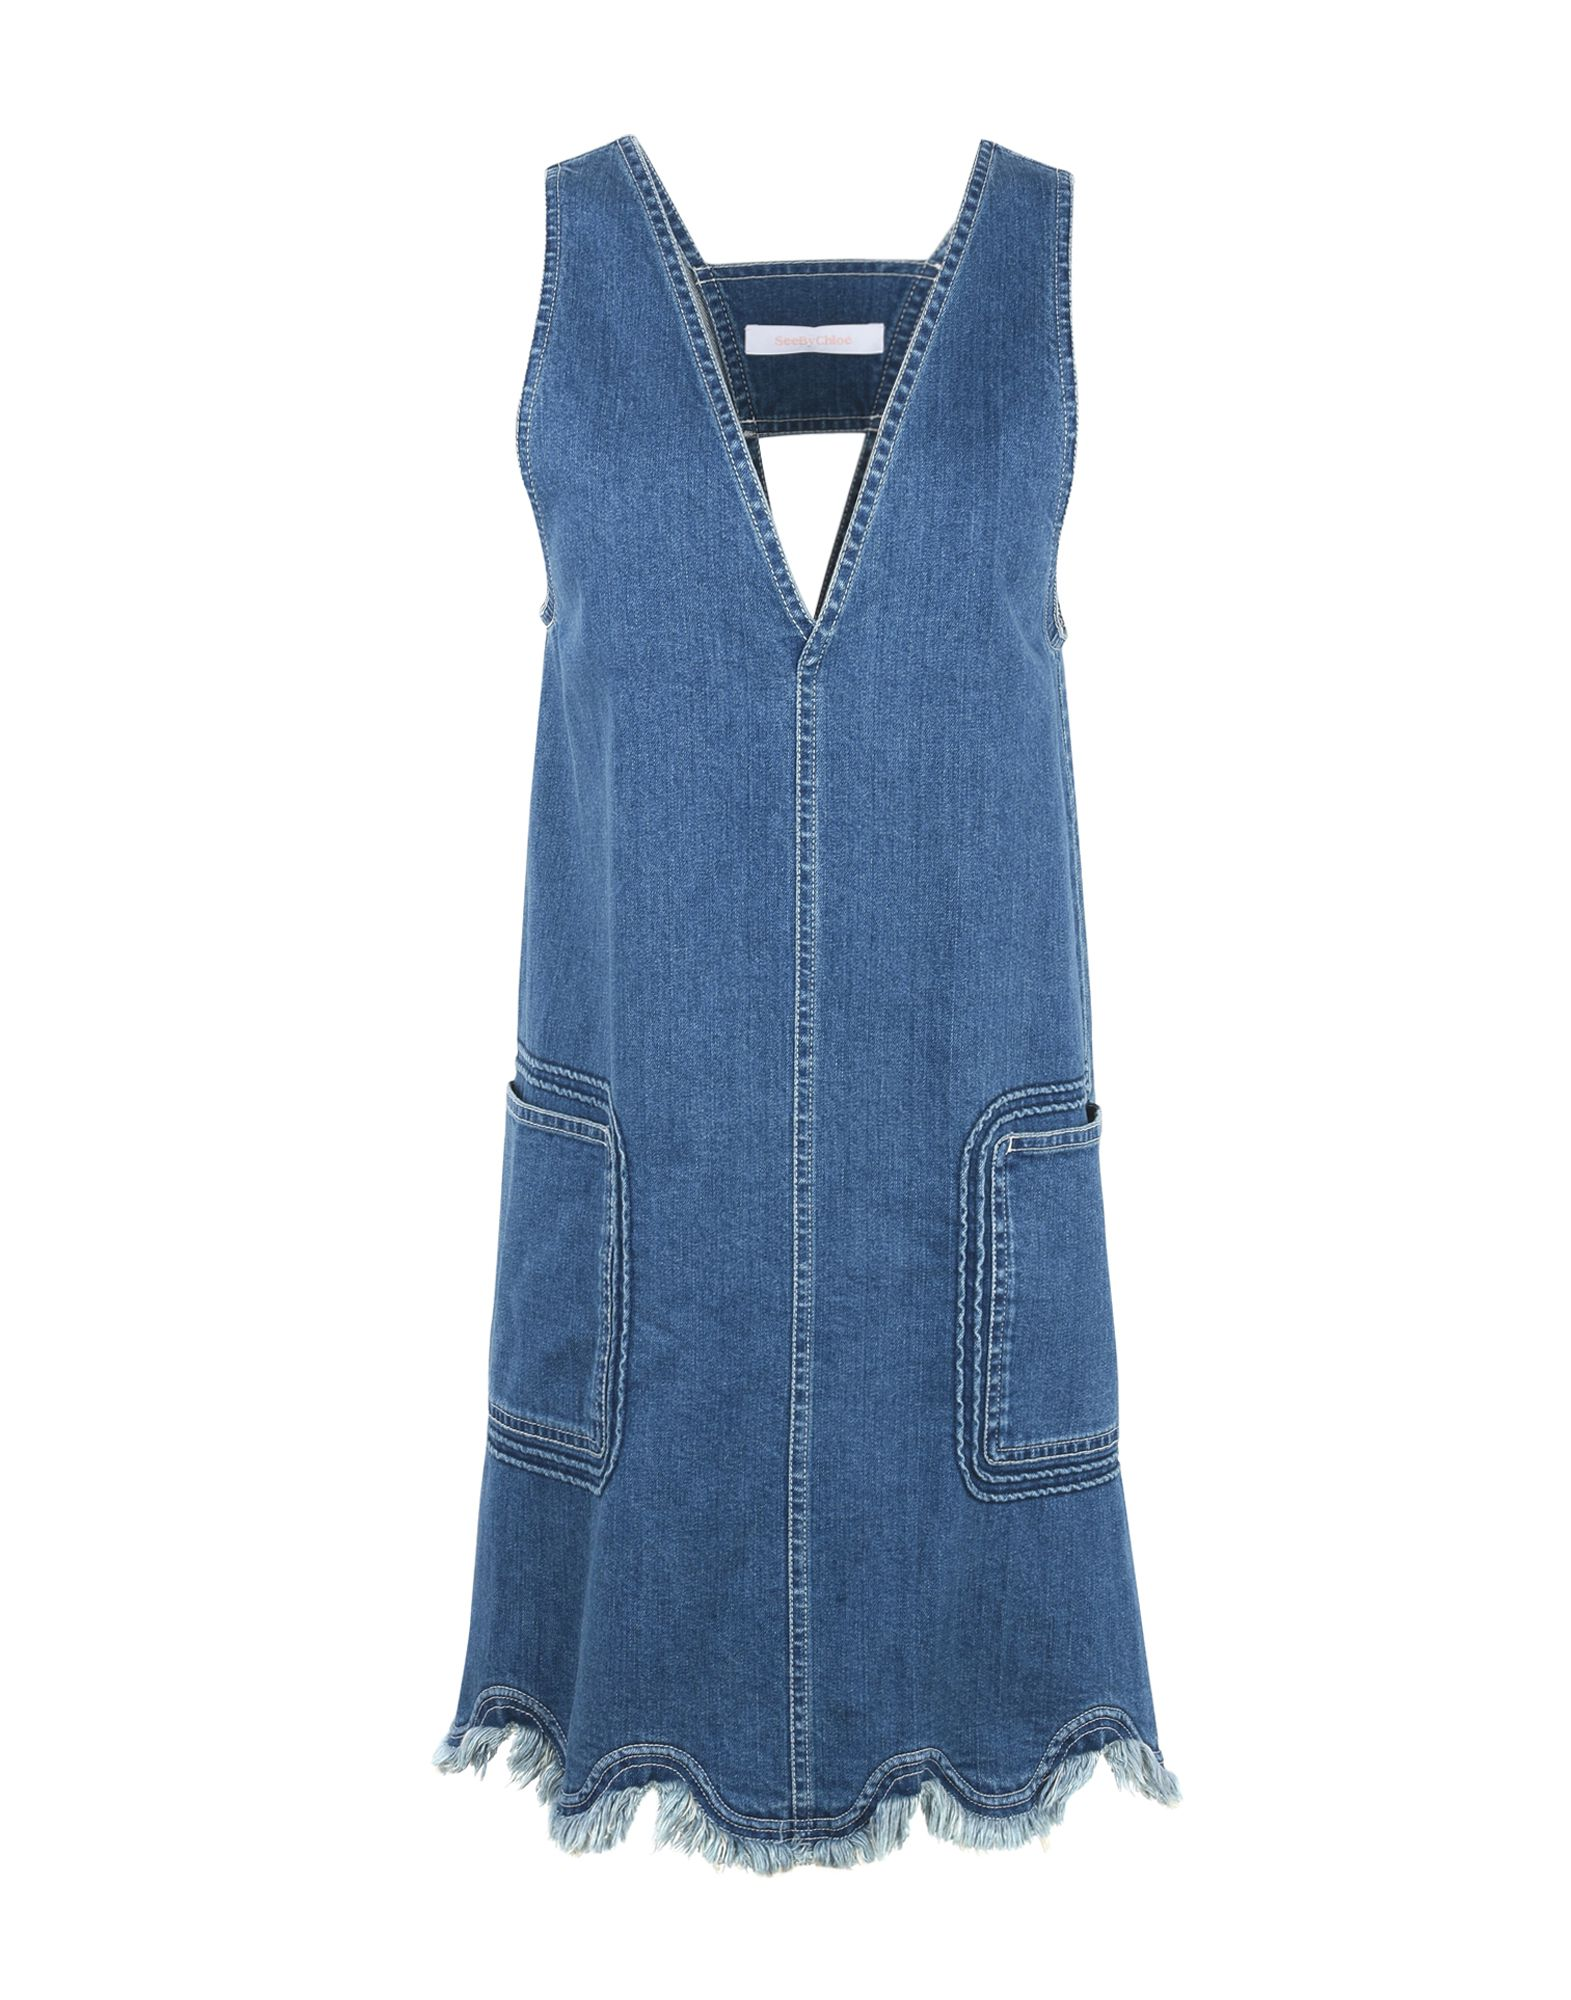 SEE BY CHLOÉ Короткое платье платье с зернистым рисунком chloé